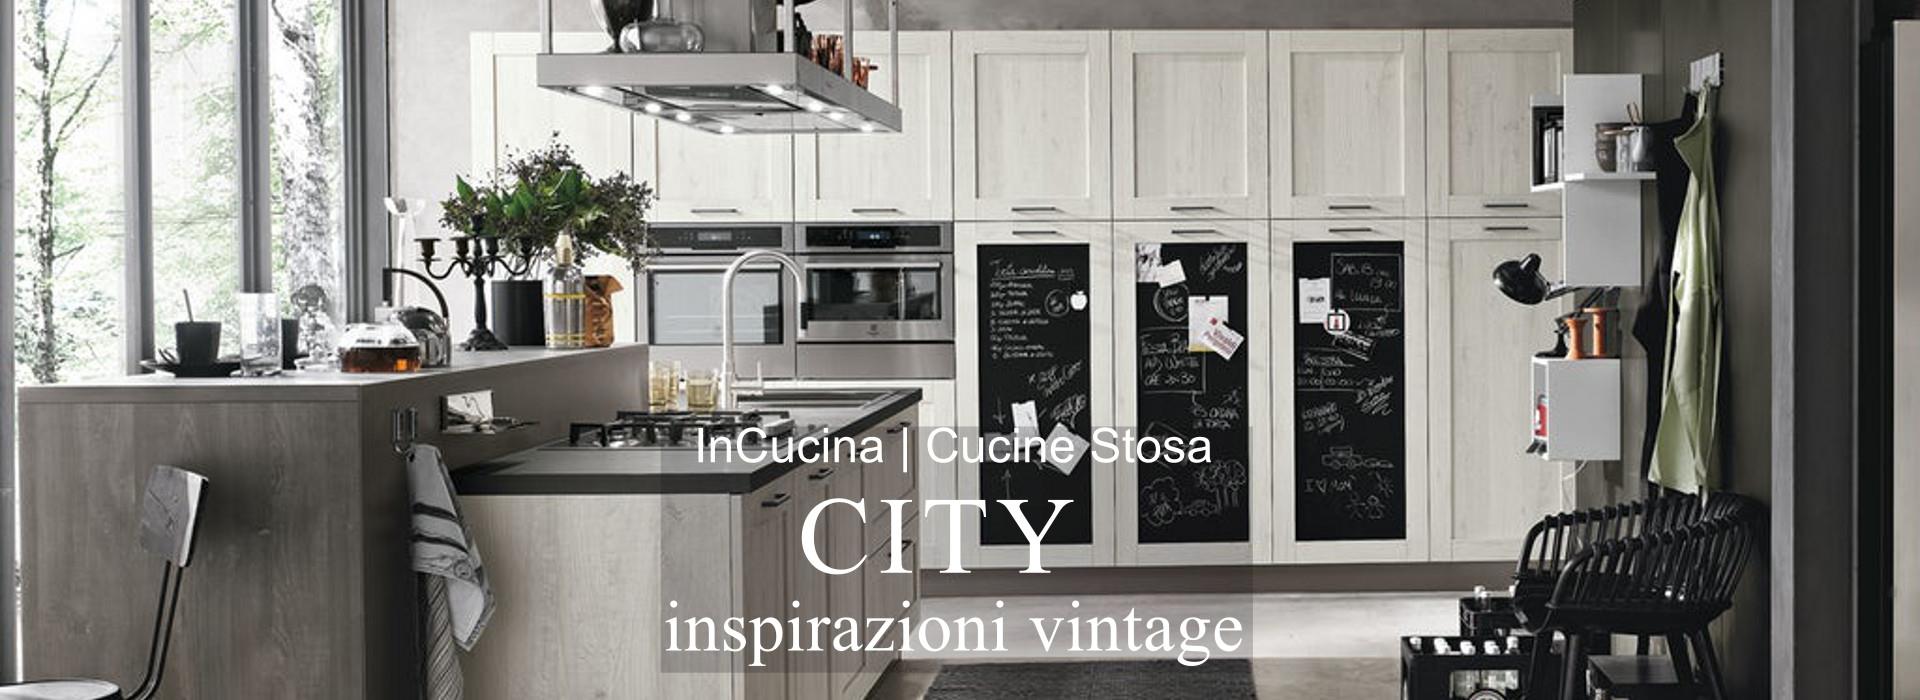 CITY_1920_700_testo